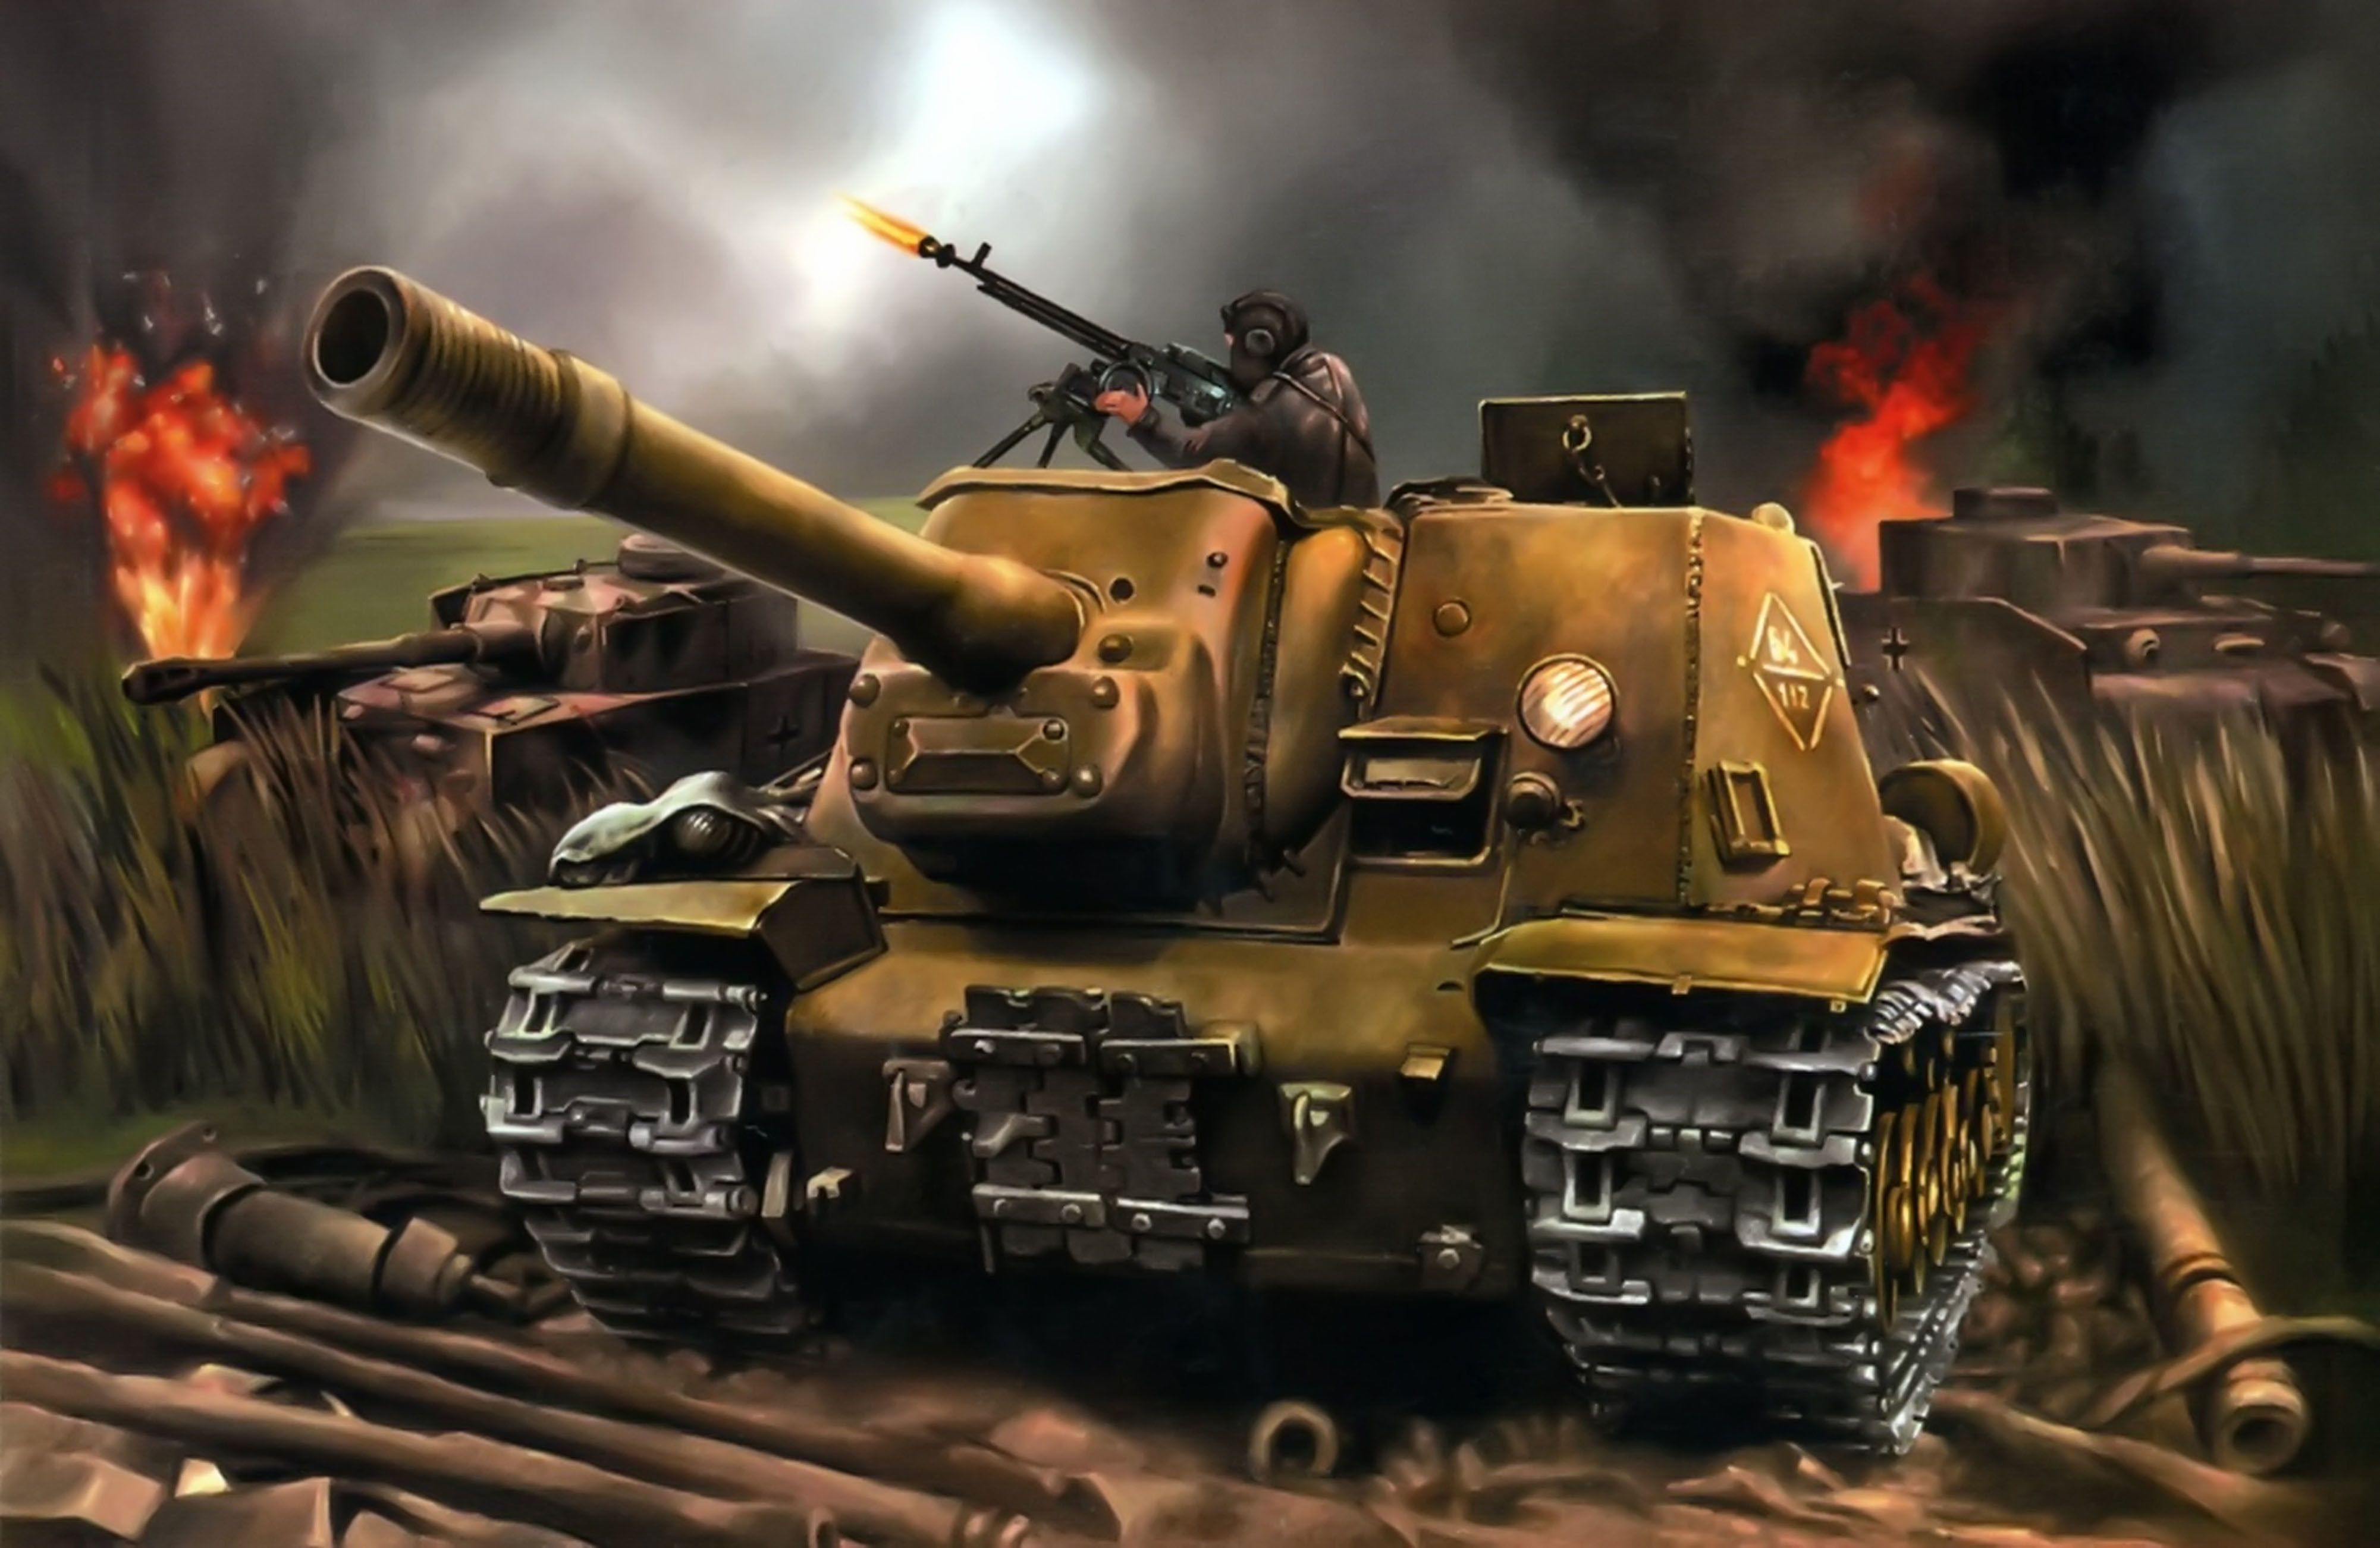 World of Tanks Painting Art SPG ISU 152 tank military battle 4002x2603